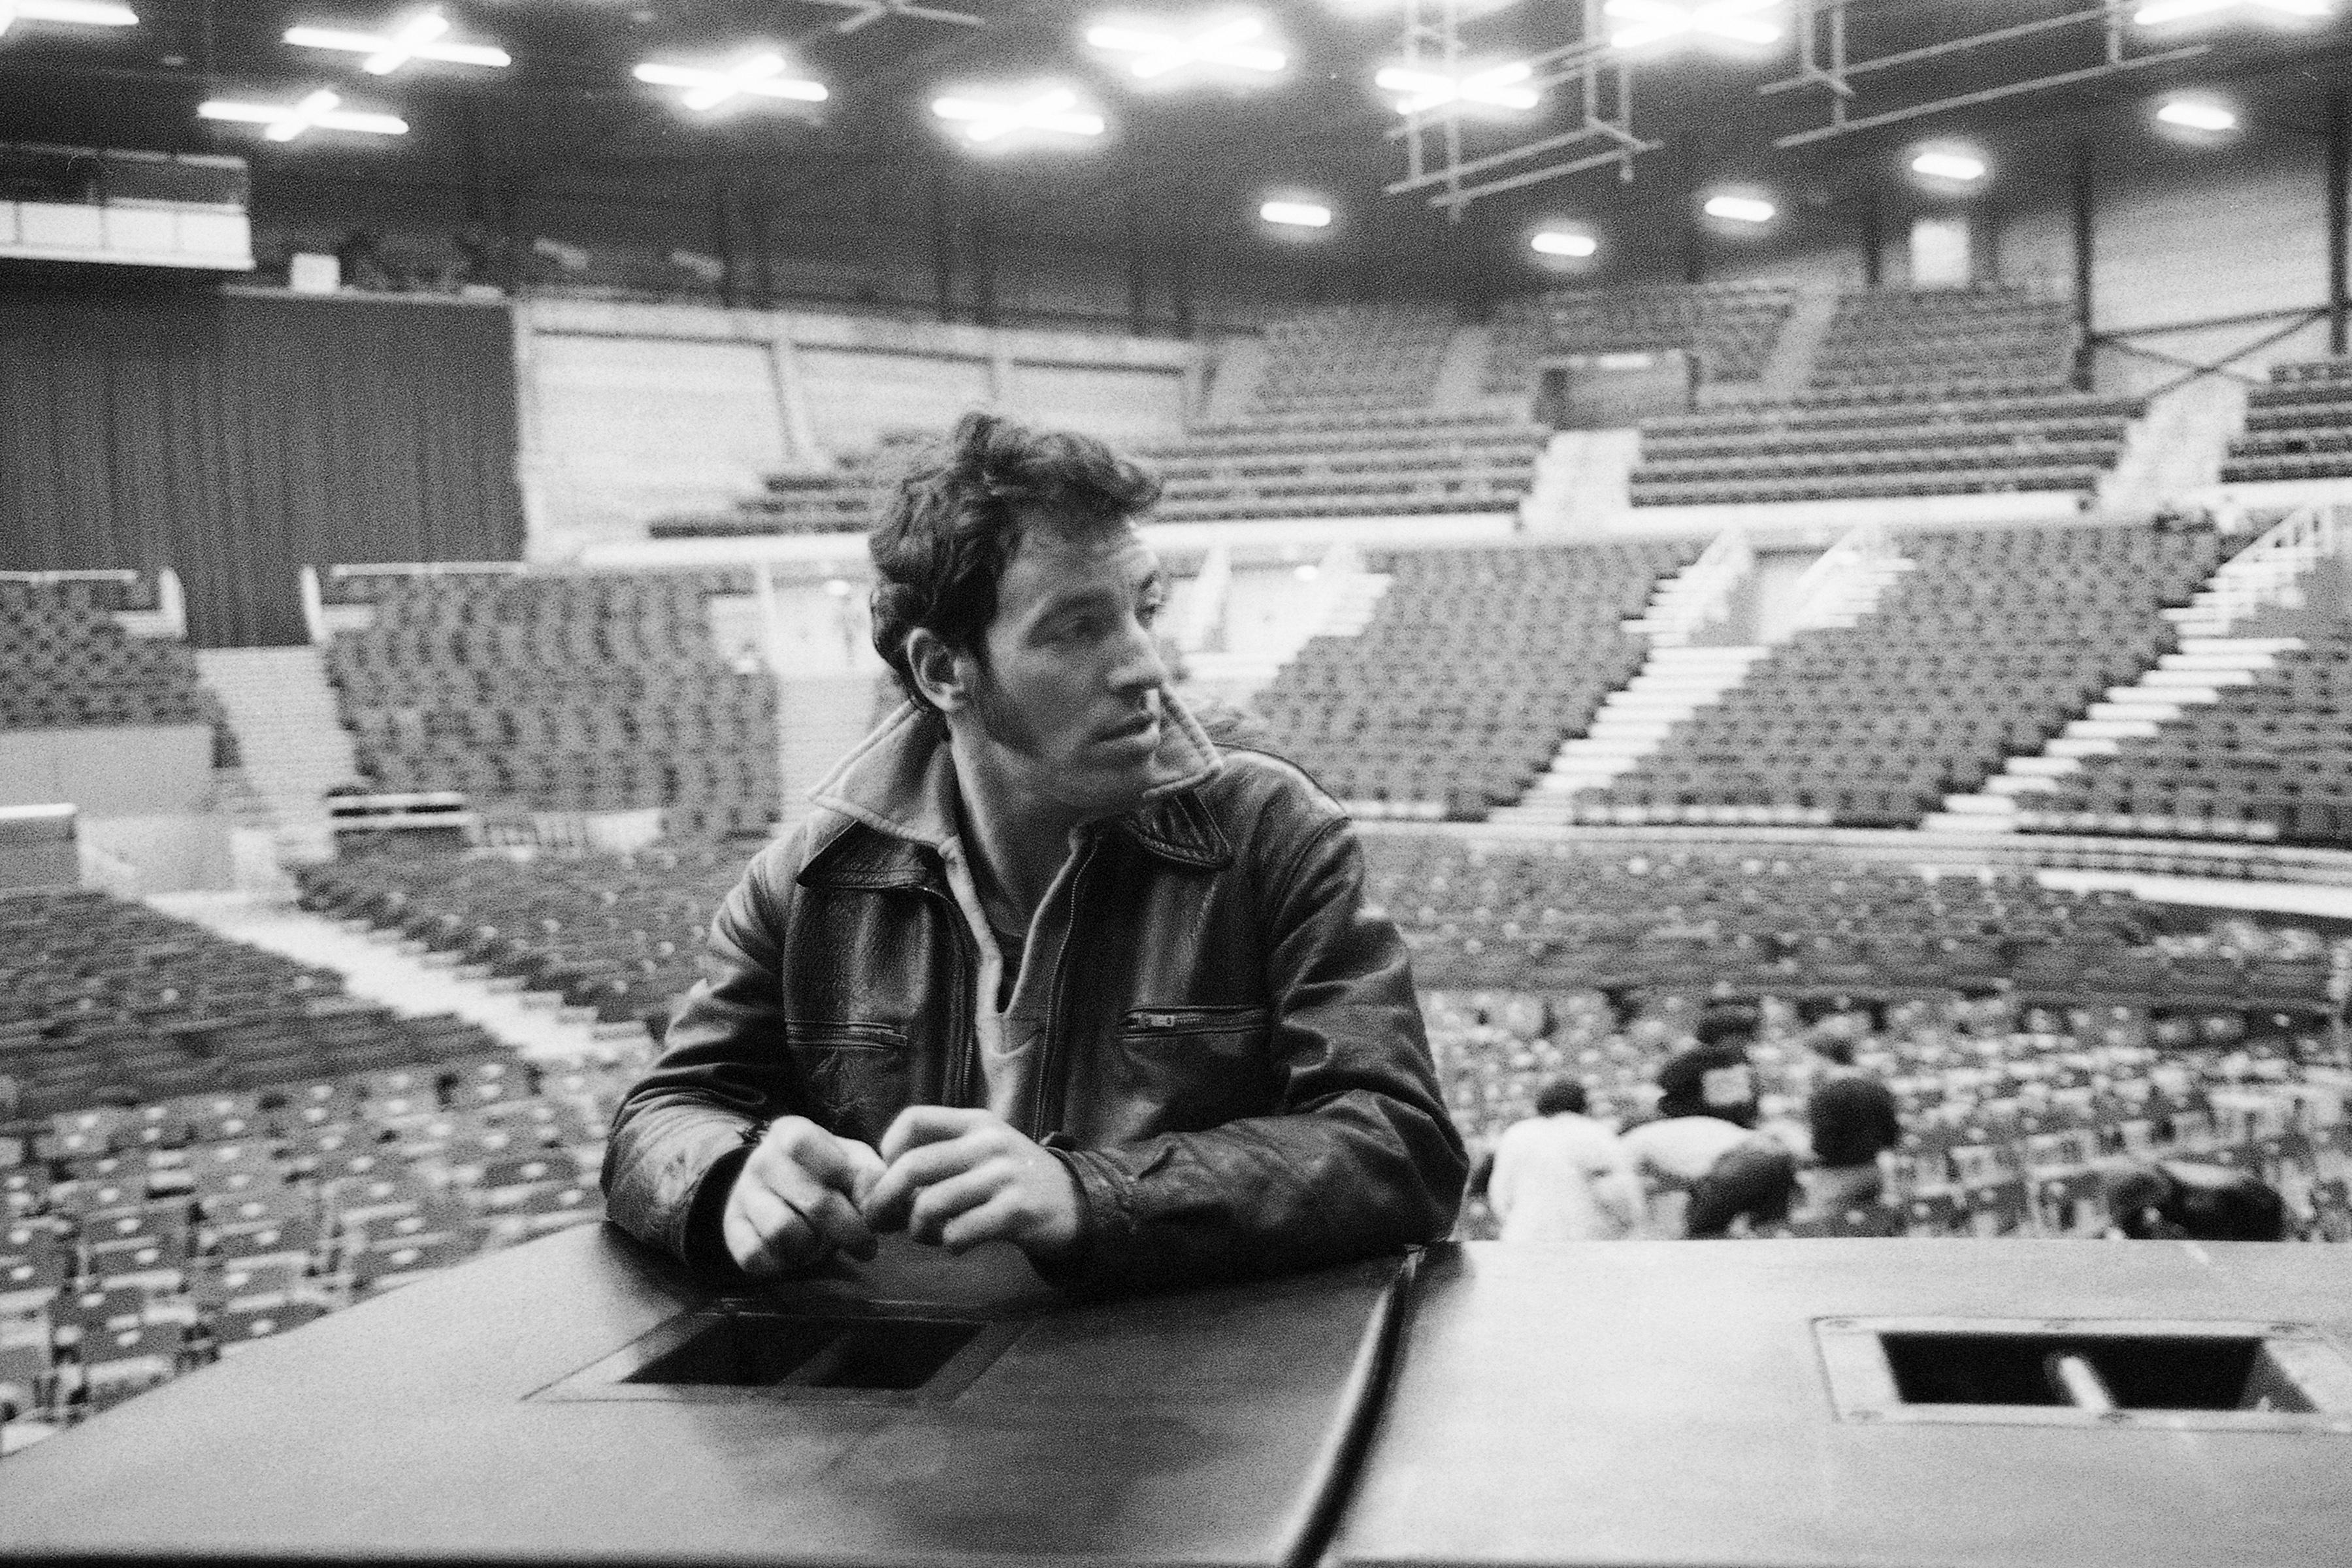 Bruce Springsteen before soundcheck in                               Brussels, Belgium on April 26, 1981.